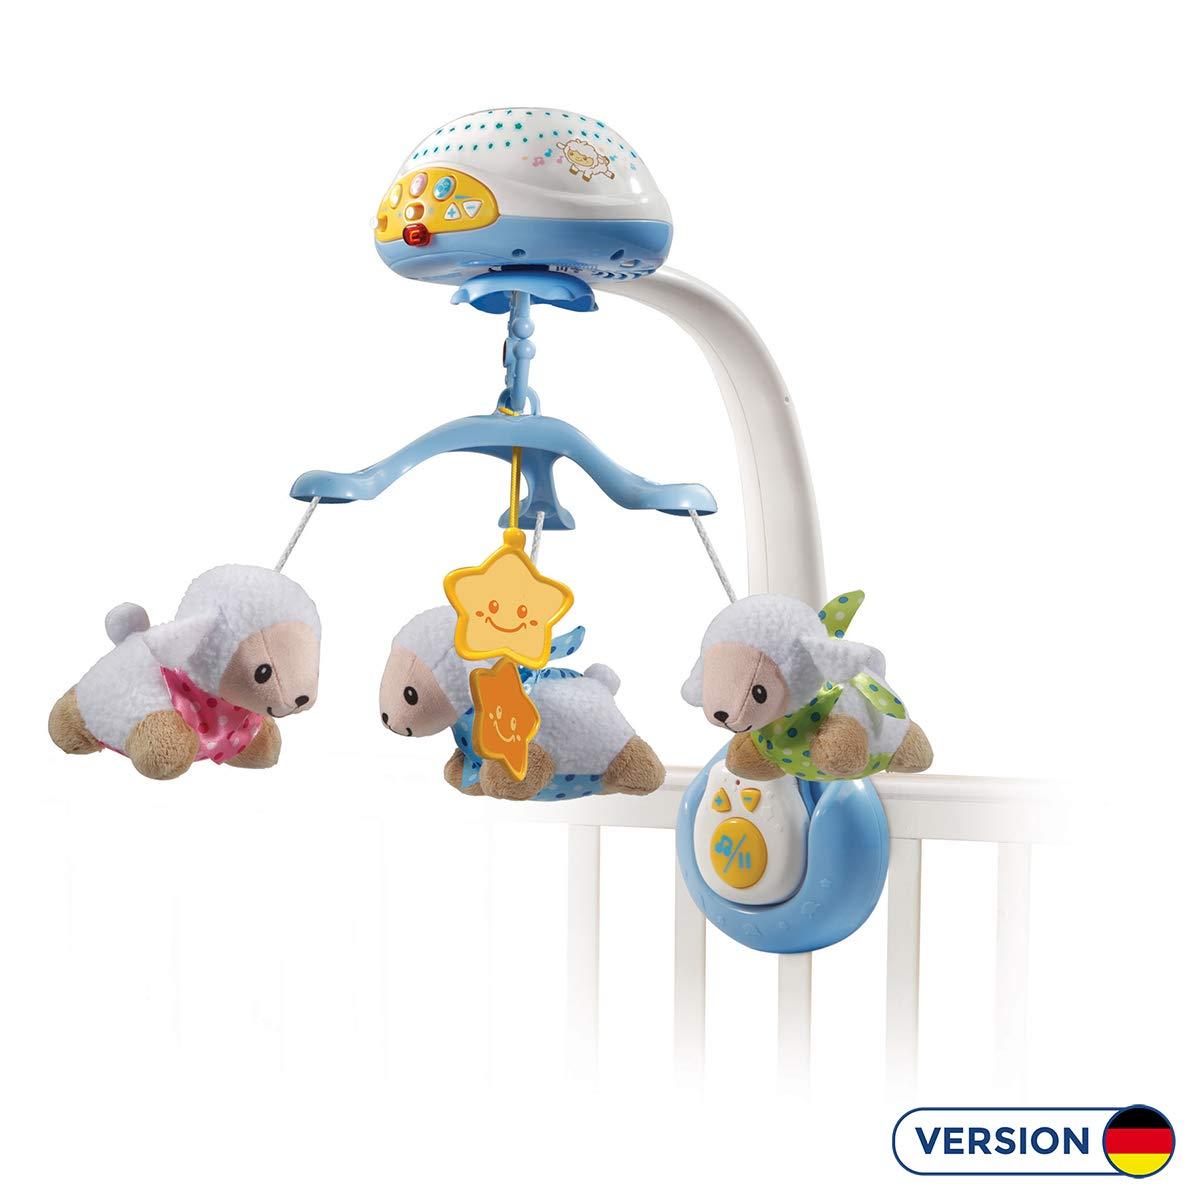 VTech Baby 80-503304 móvil para Bebes - Móvil para Cuna (Universal,, Niño/niña, 2 año(s), 45 min, AA)